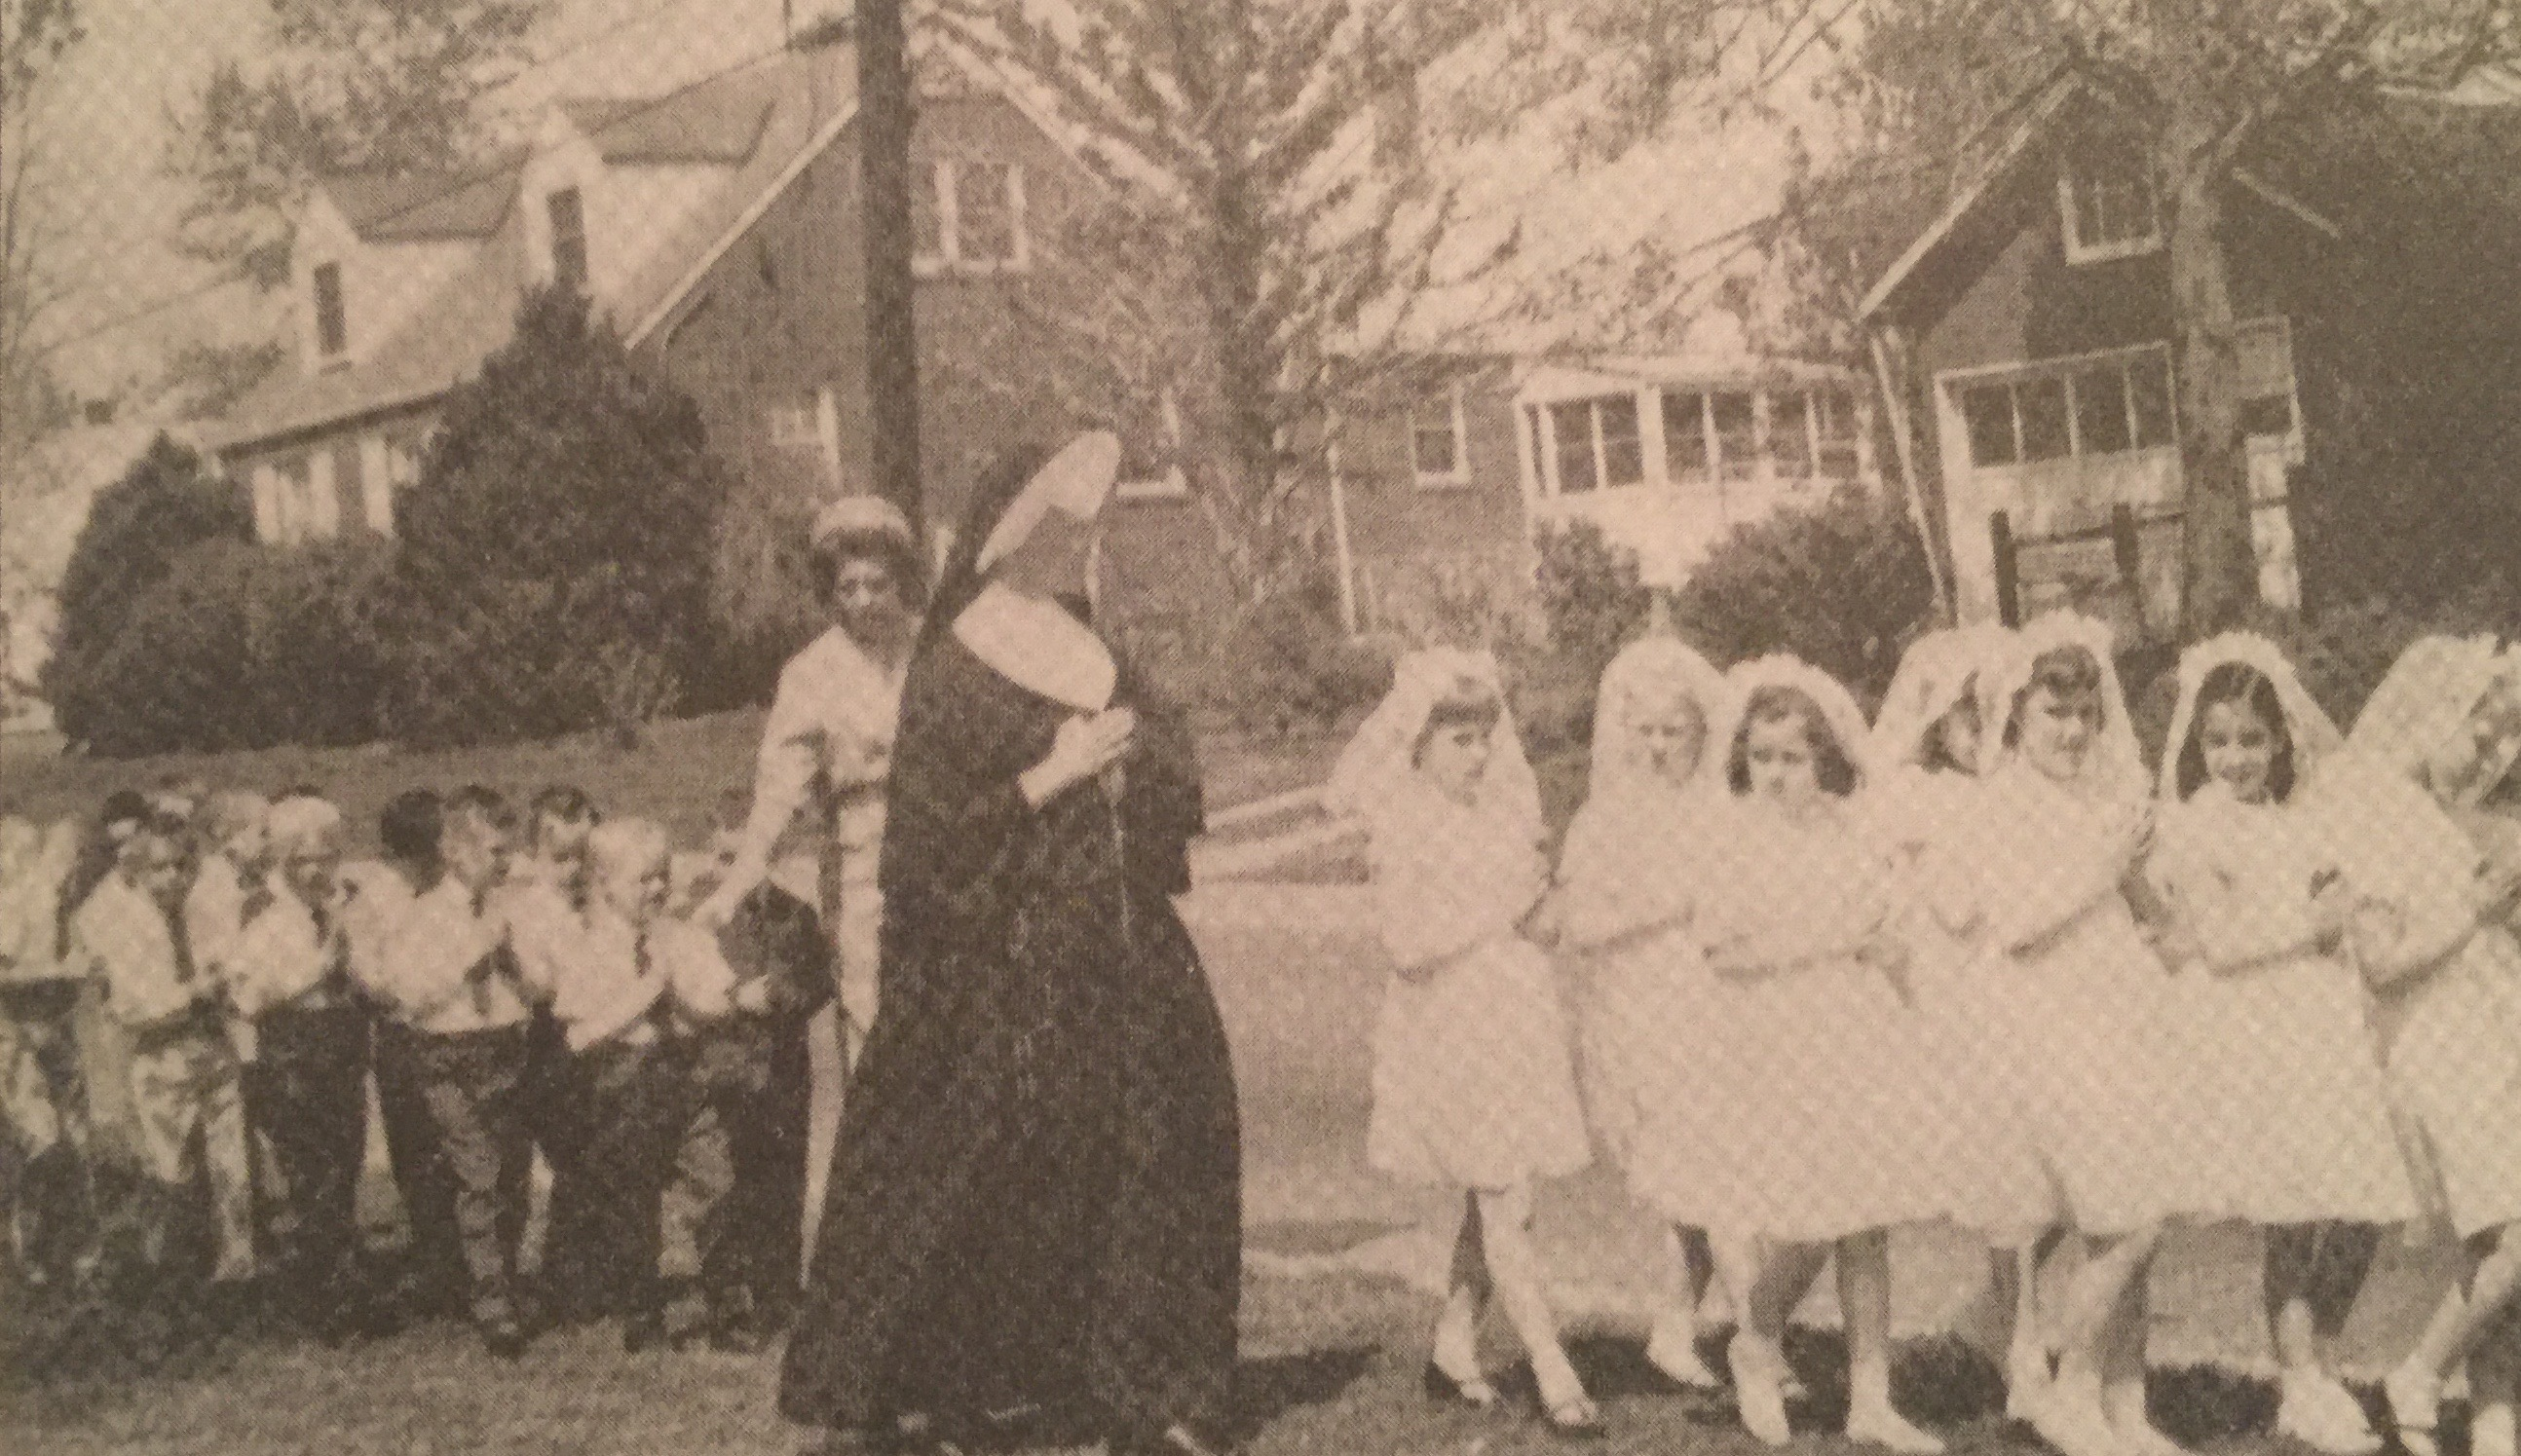 Blessed Sacrament Catholic Church on Braddock Road